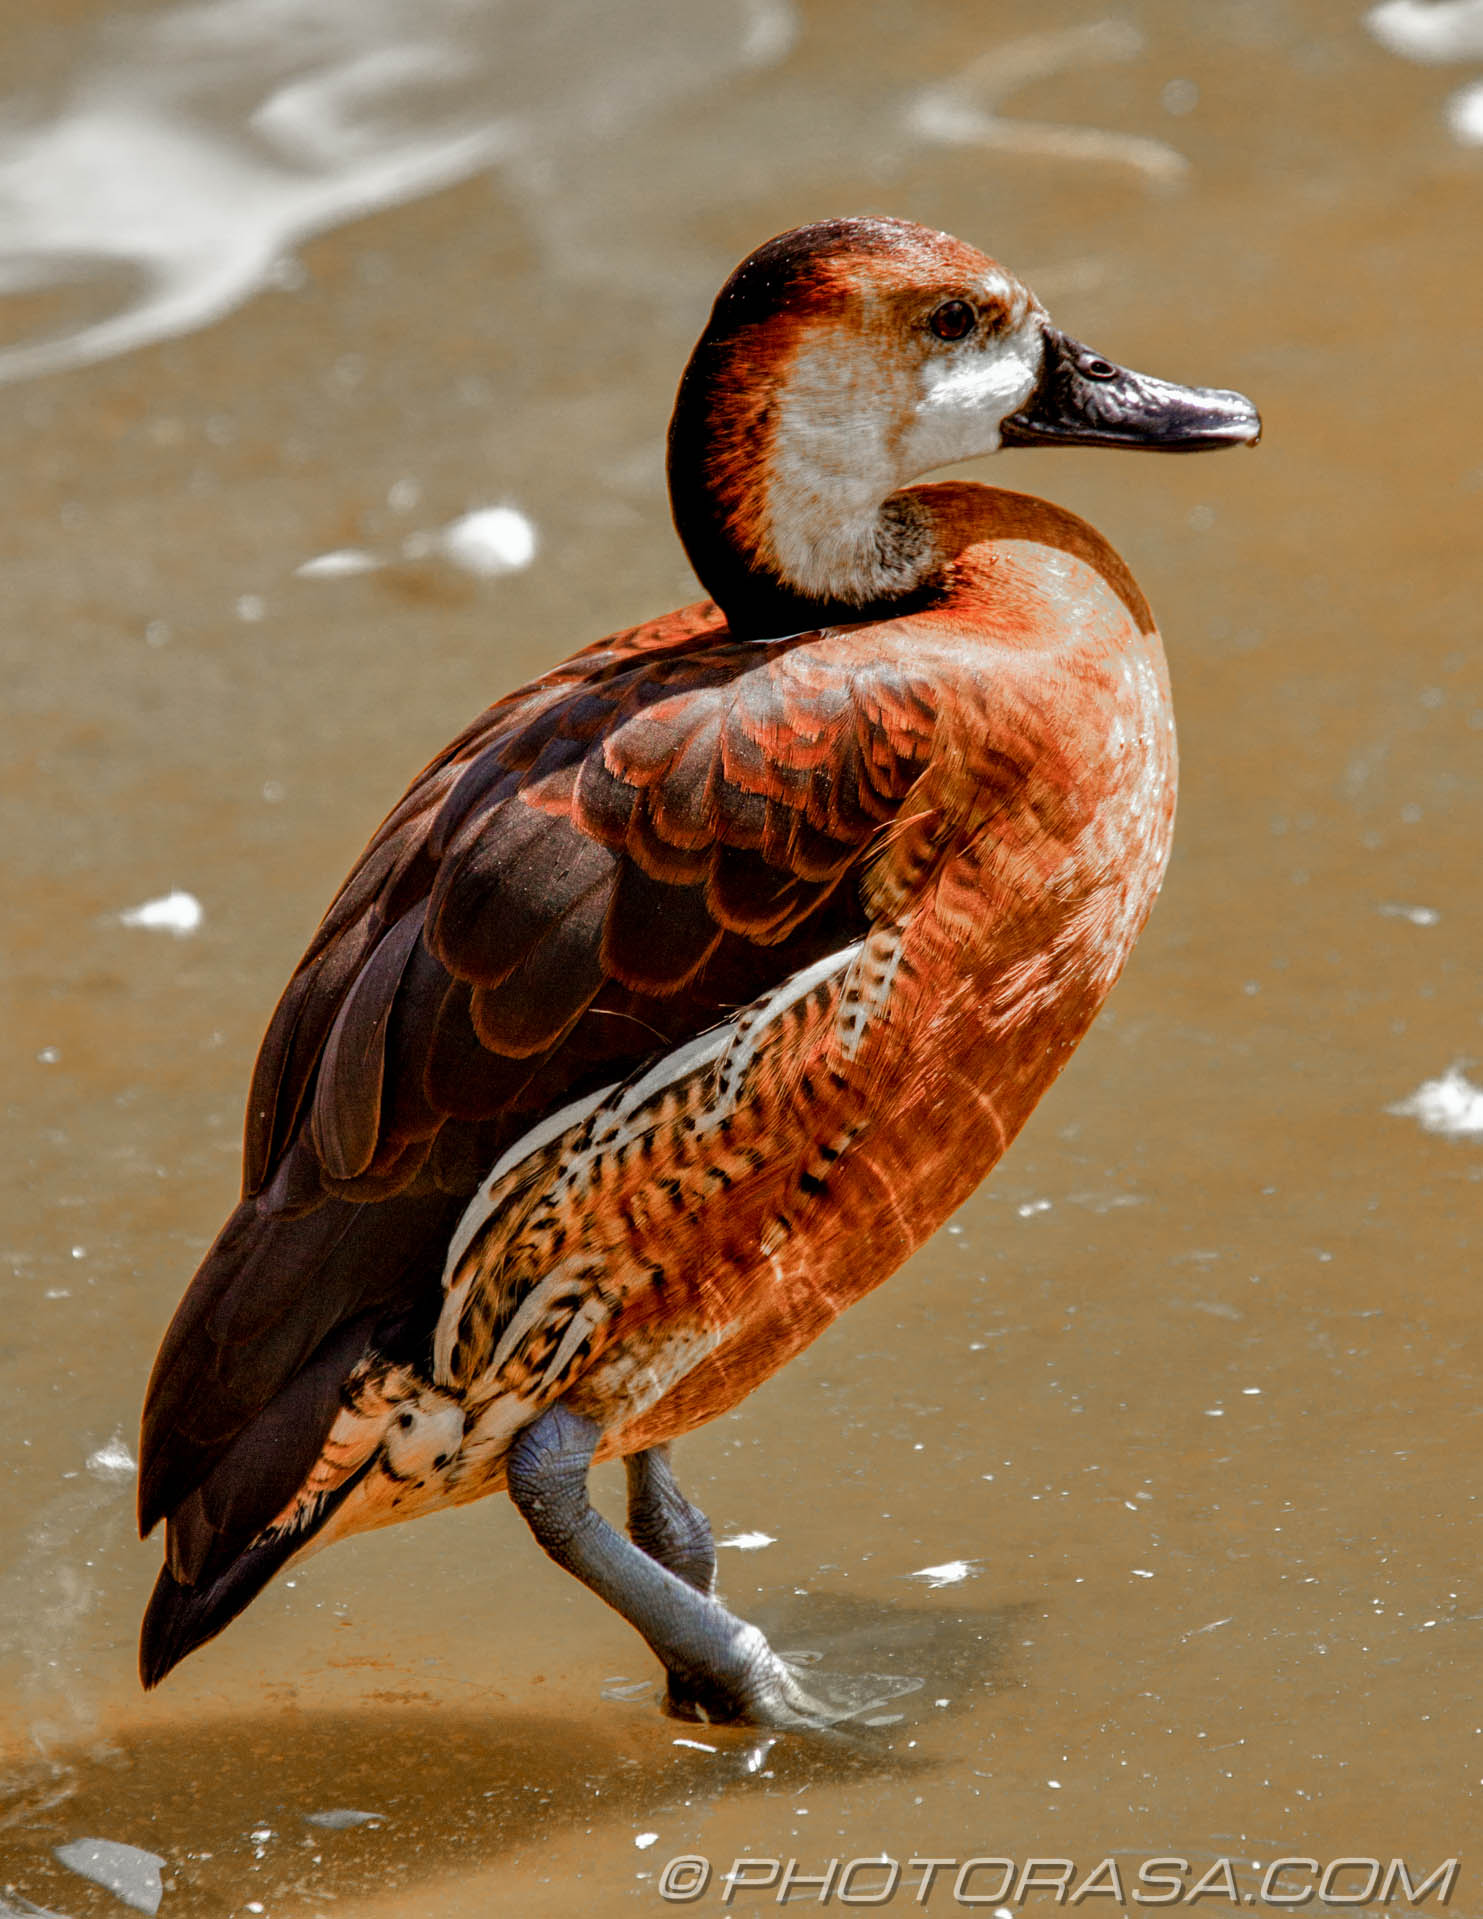 http://photorasa.com/birds-greenworld/orange-red-and-brown-duck/